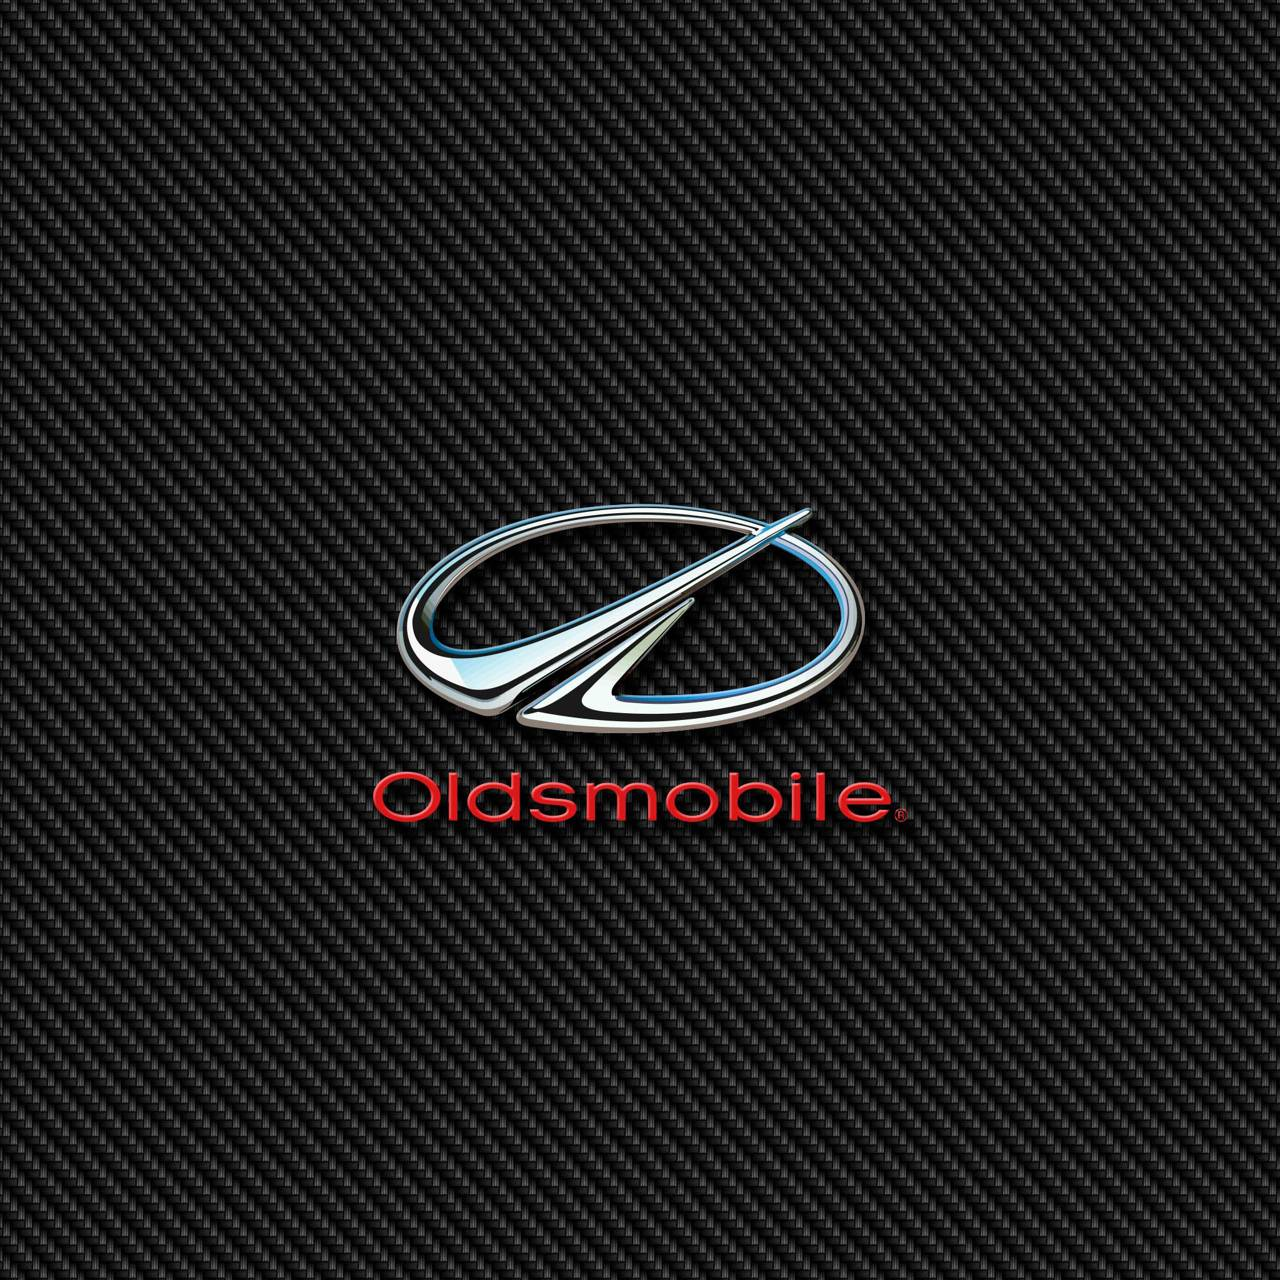 Oldsmobile Carbon 2